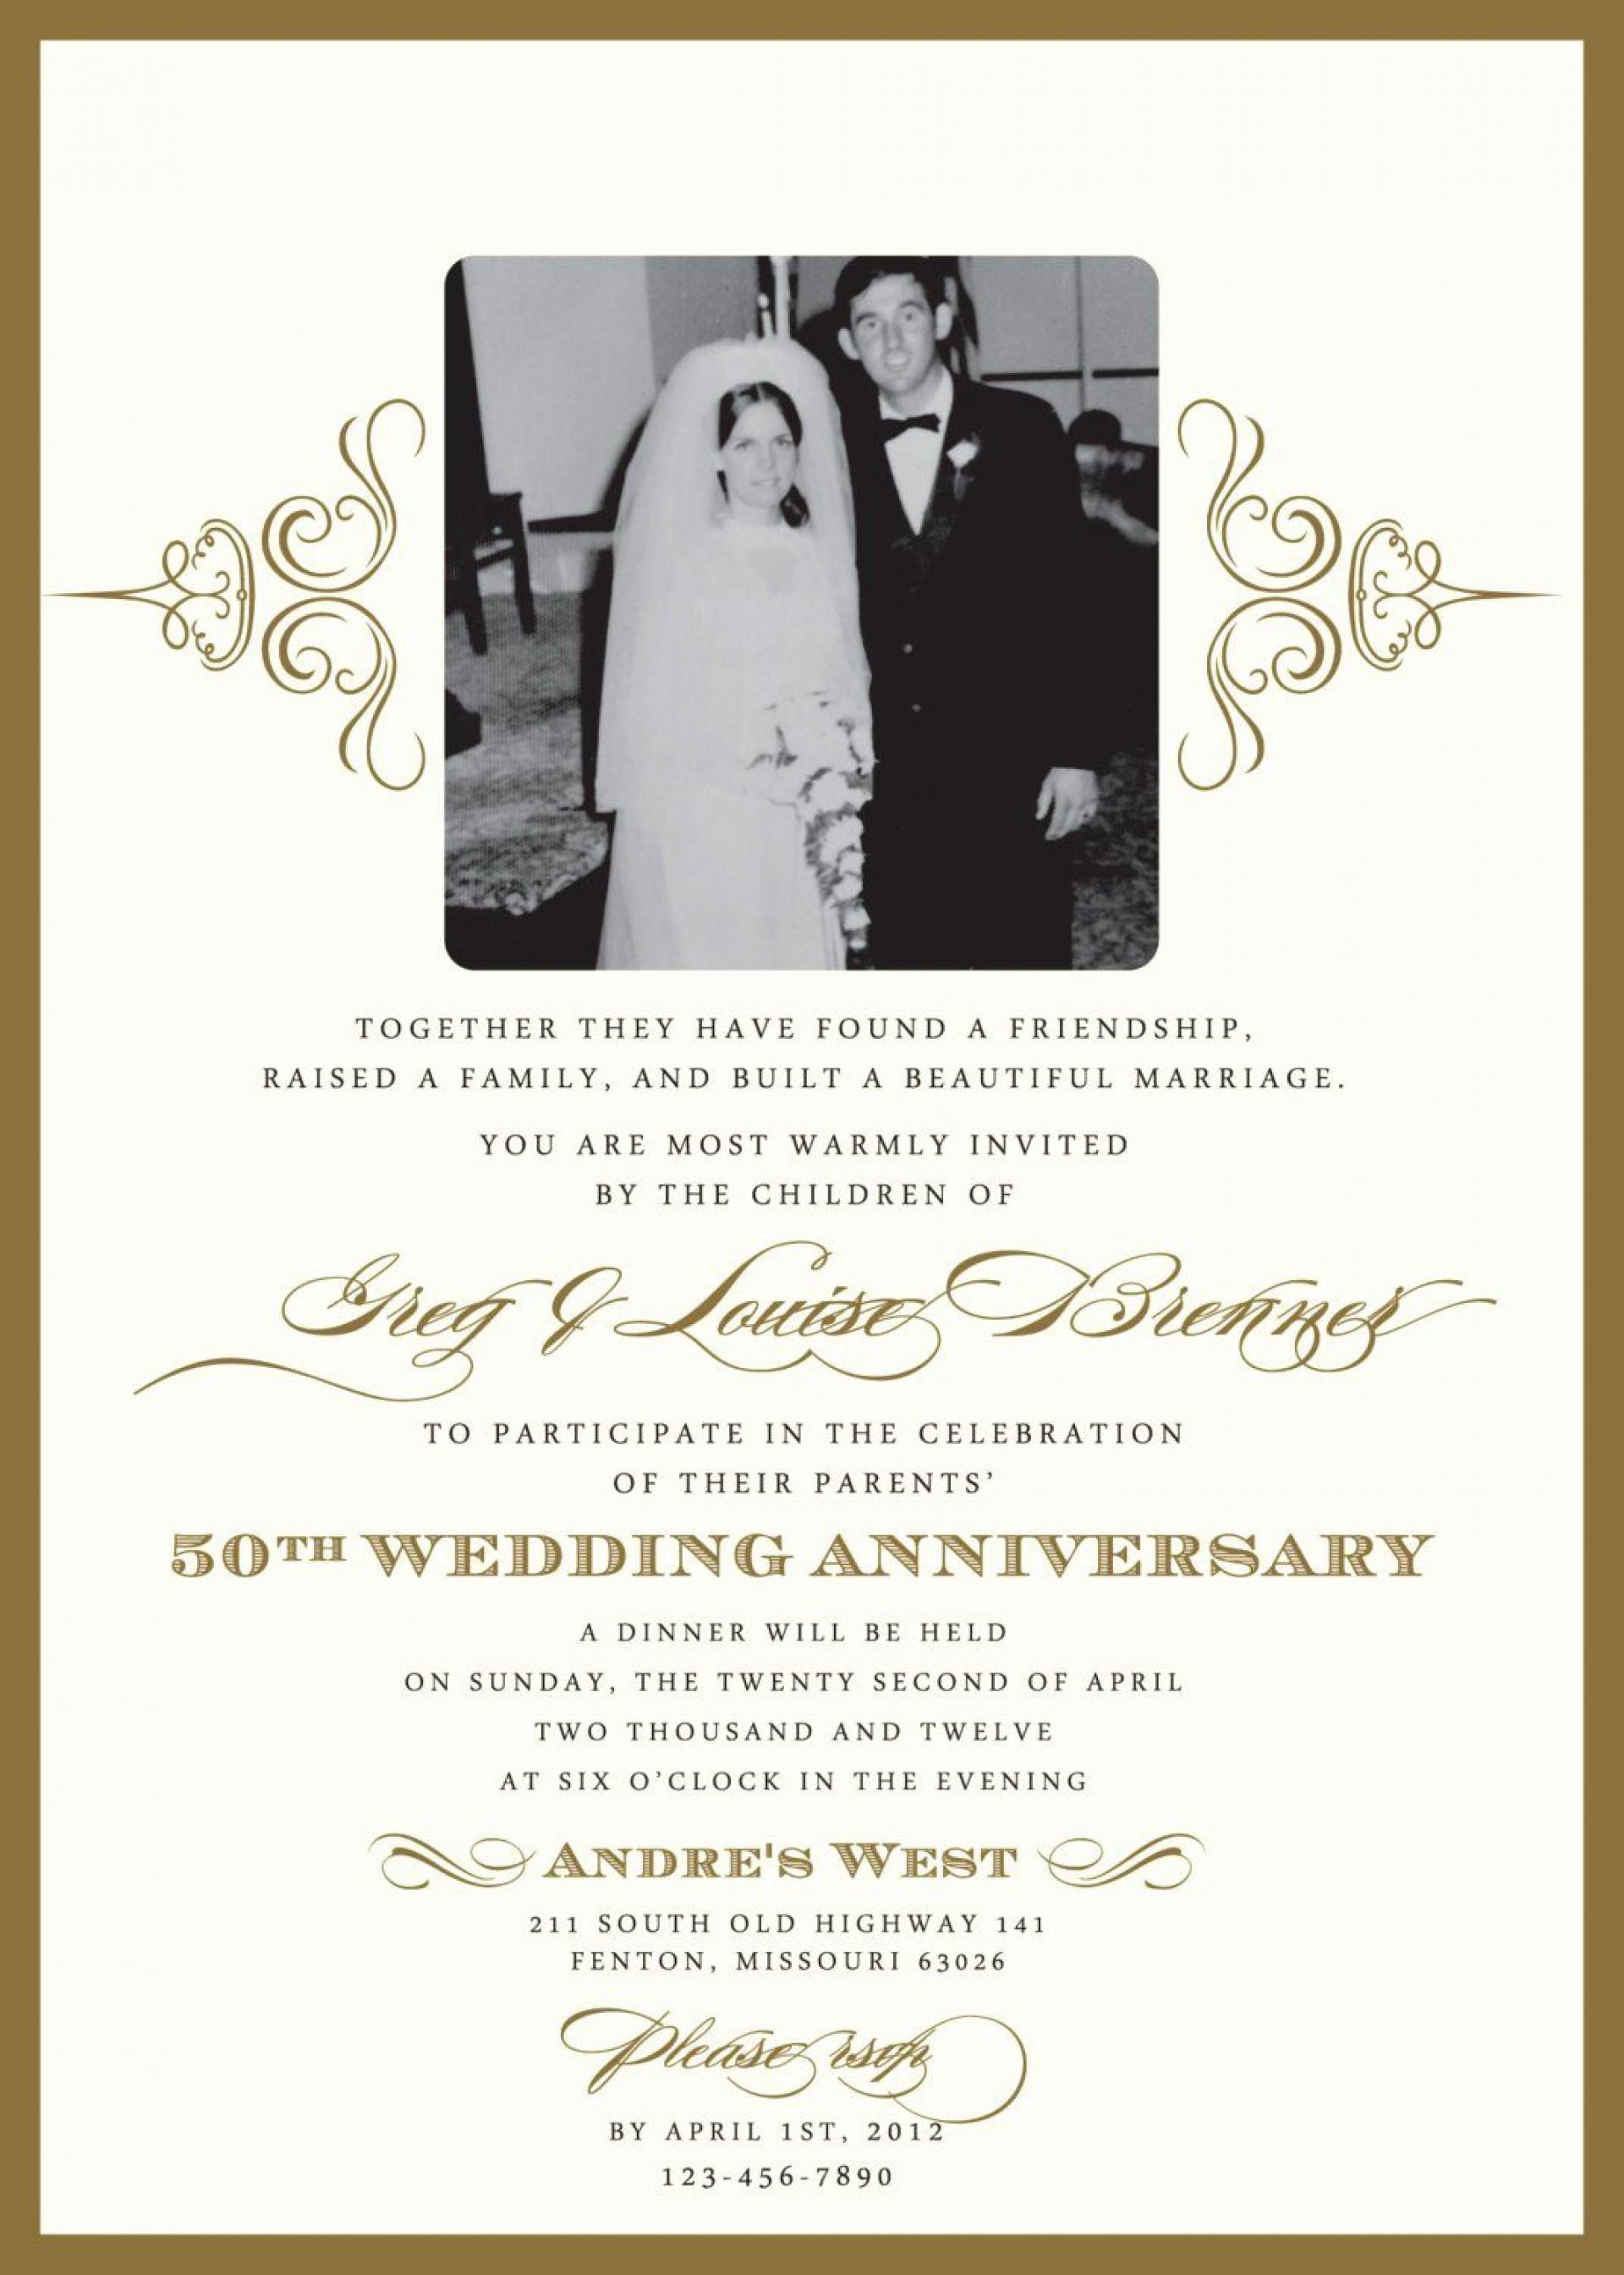 002 Impressive 50th Wedding Anniversary Invitation Design High Def  Designs Wording Sample Card Template Free Download1920